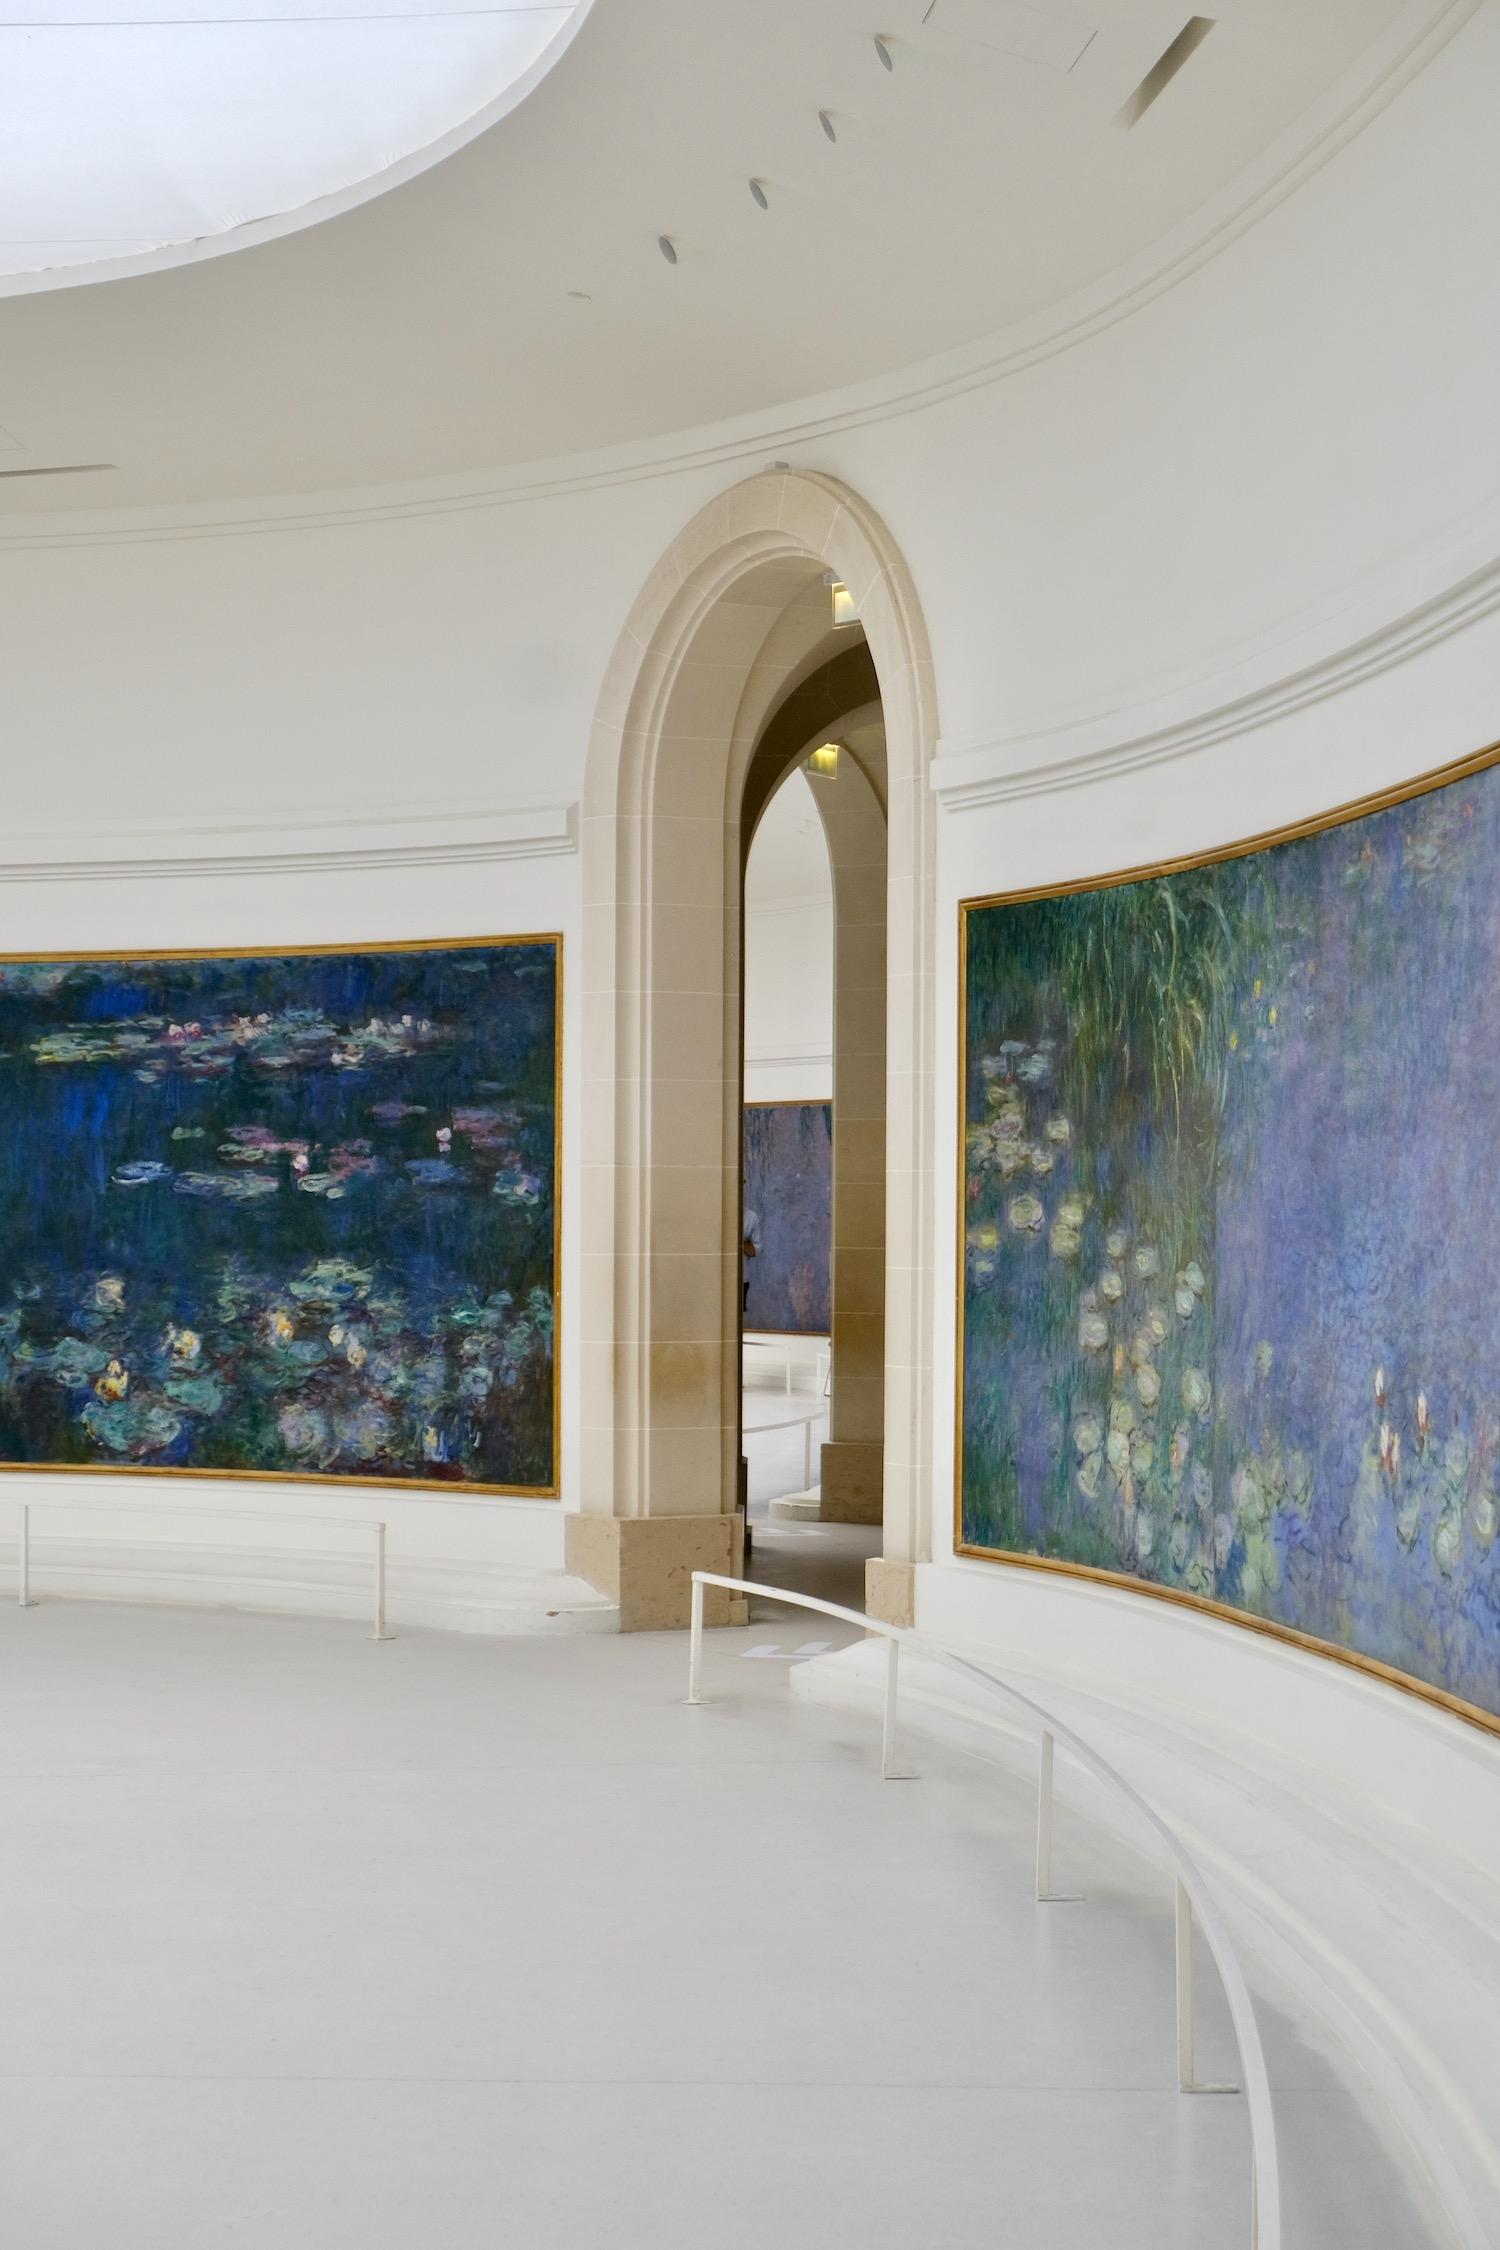 room in Musée de l'Orangerie, one of the best small museums in Paris